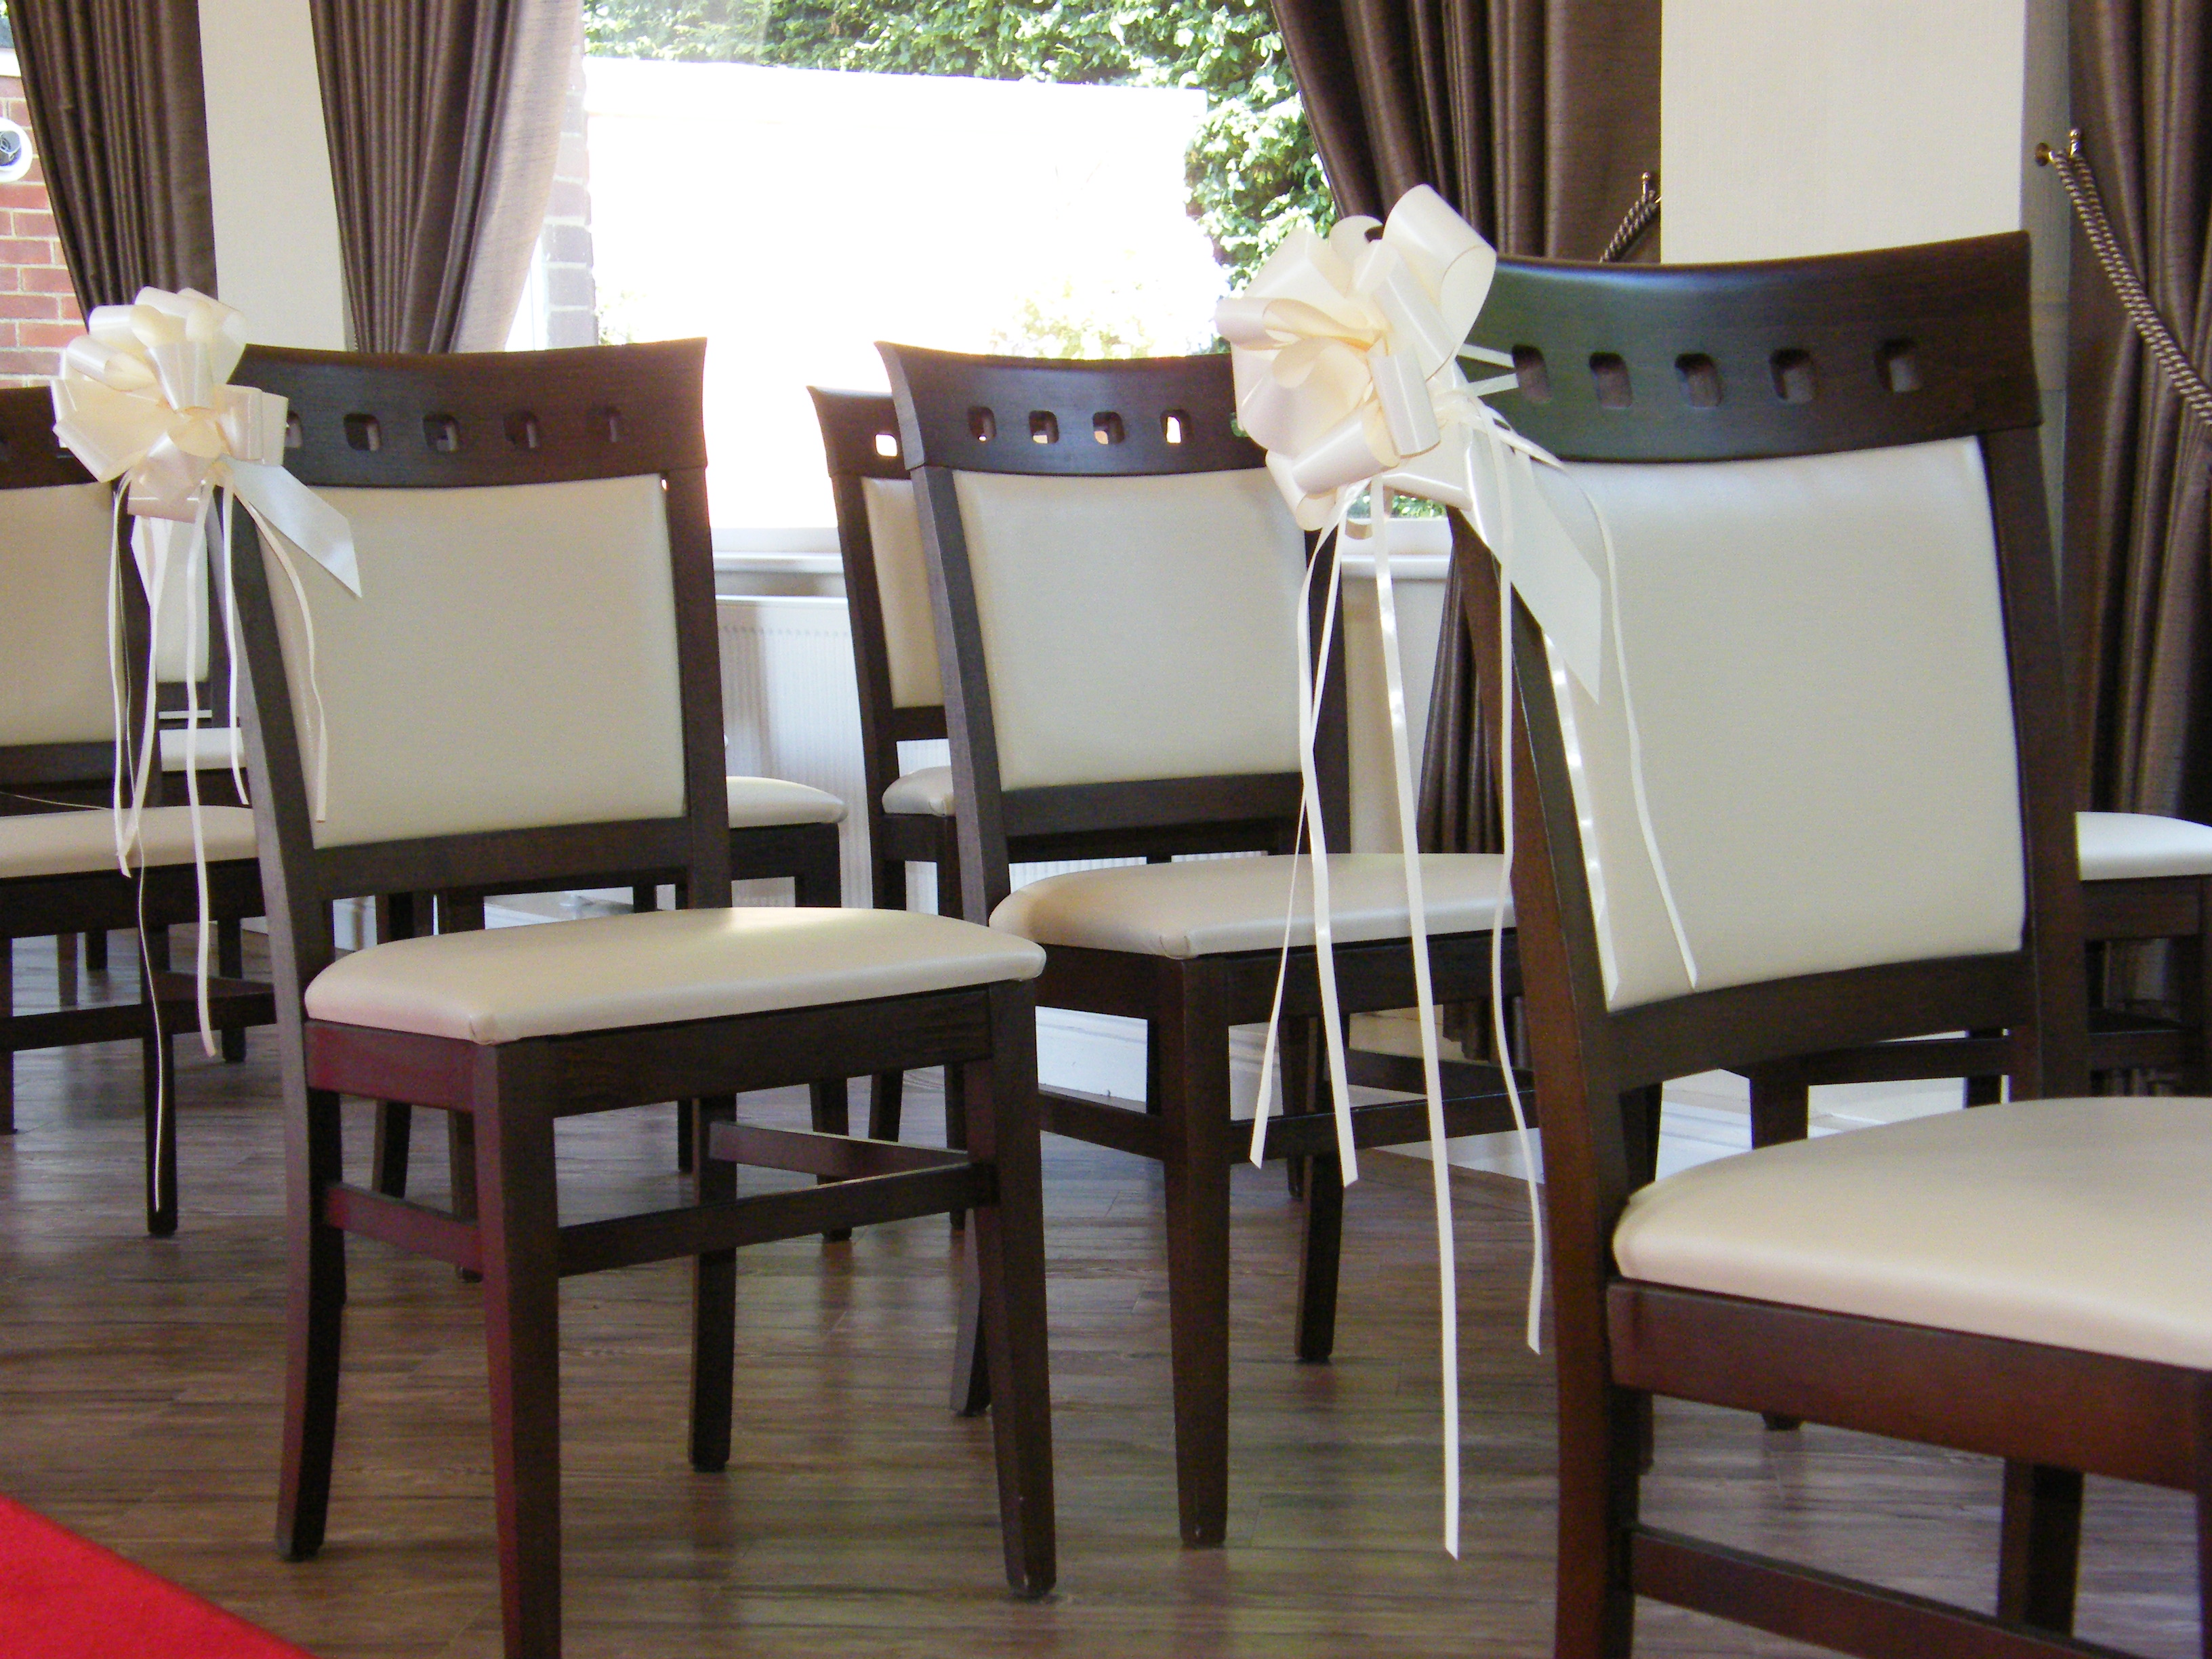 Orangery chairs